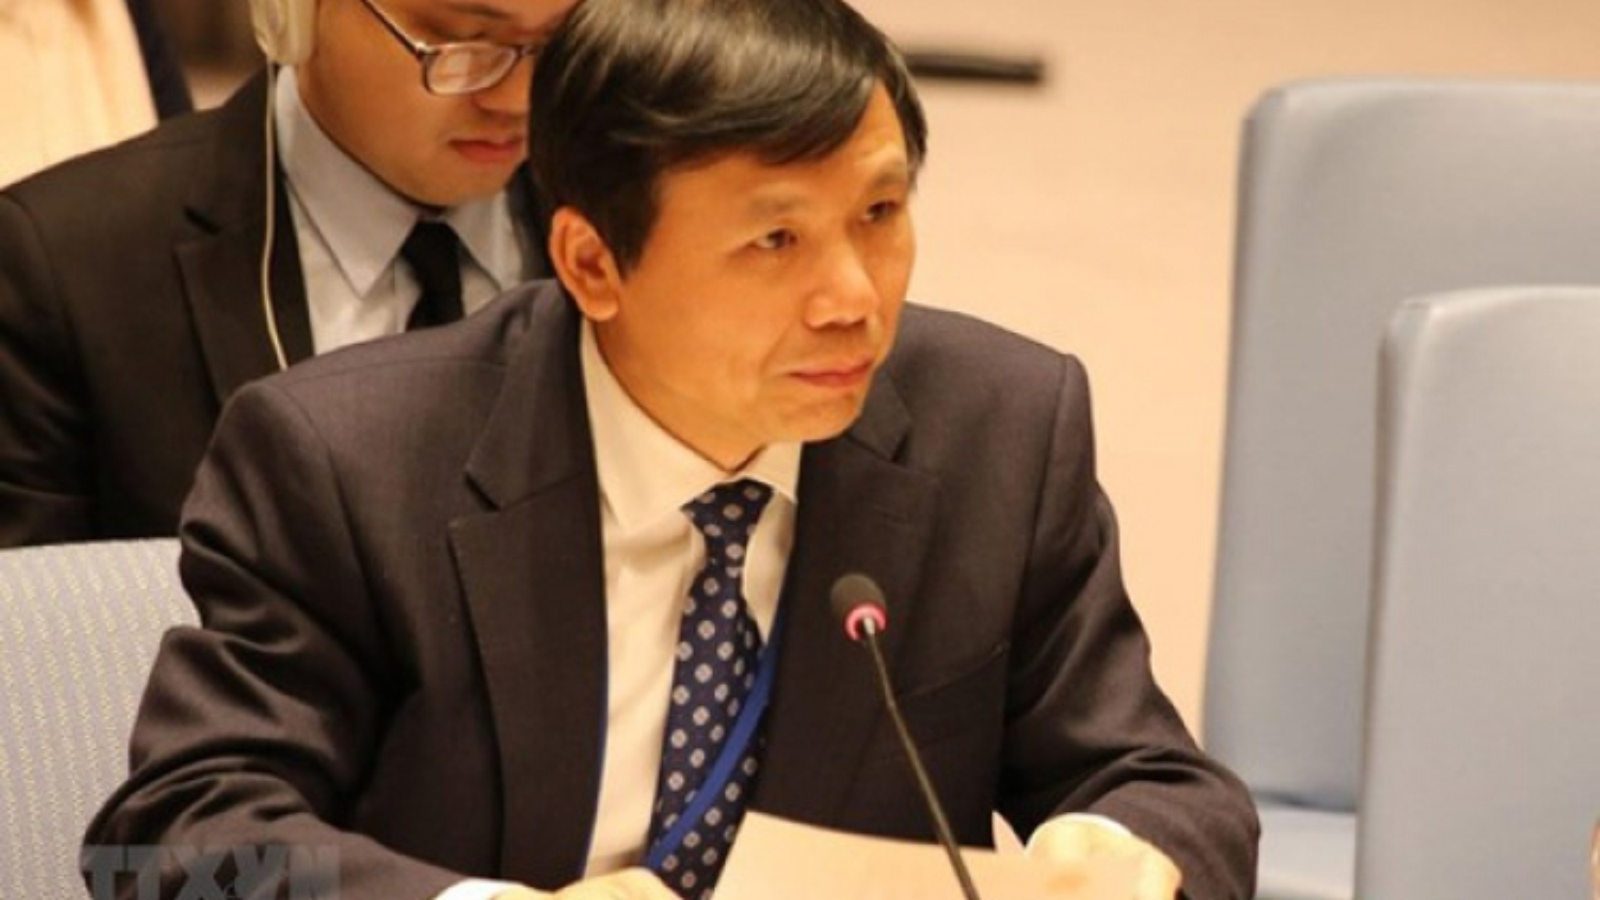 Vietnam shows deep concern about unfolding situation in East Jerusalem